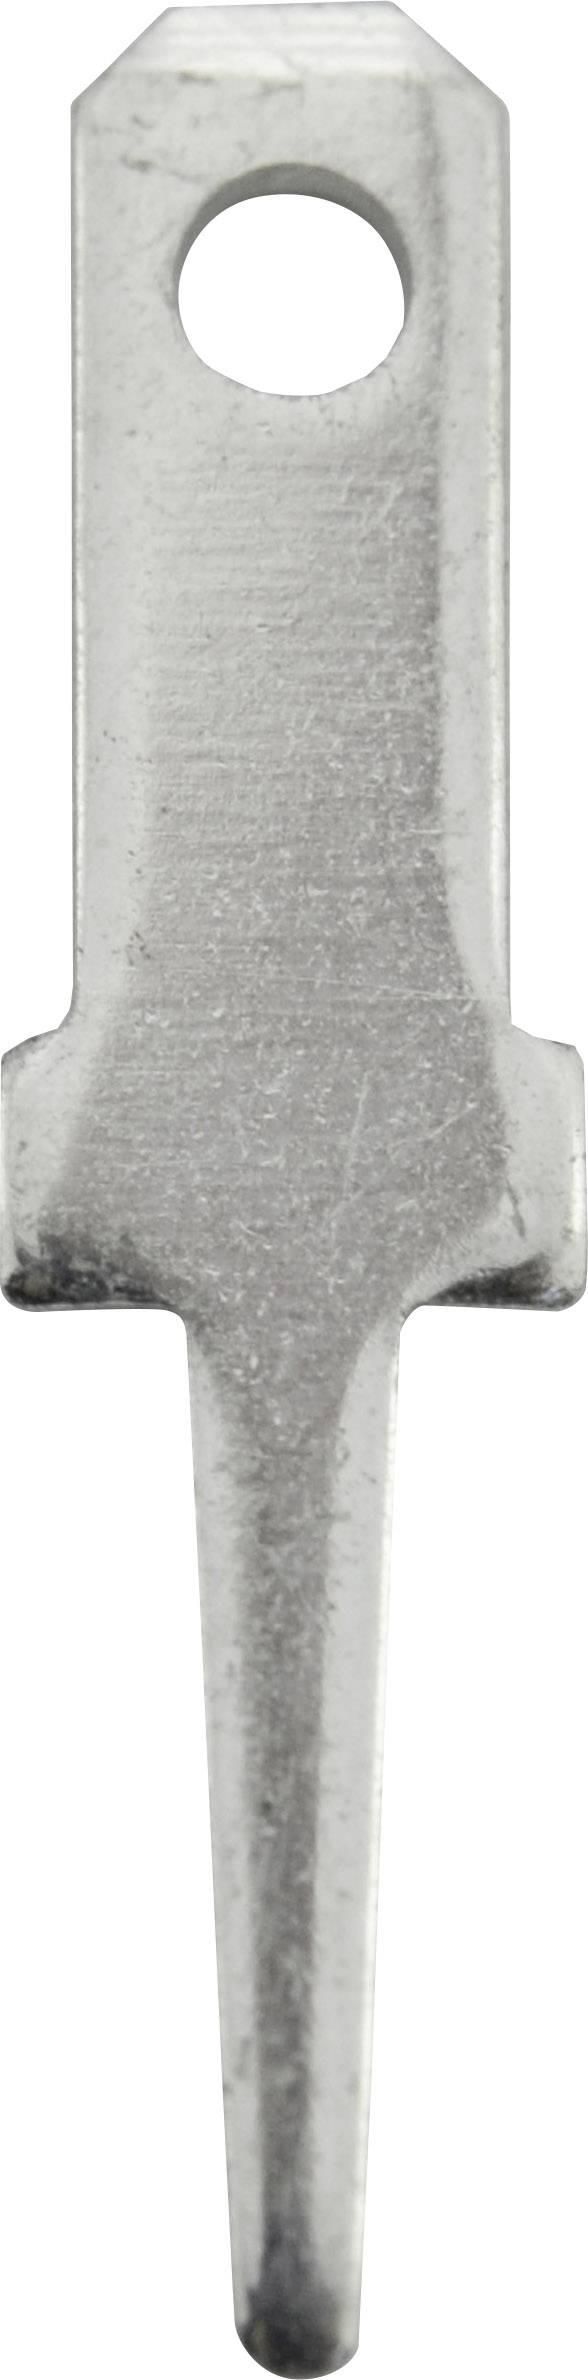 Faston zástrčka Vogt Verbindungstechnik 3775b08.68 2.8 mm x 0.8 mm, 180 °, bez izolace, kov, 100 ks